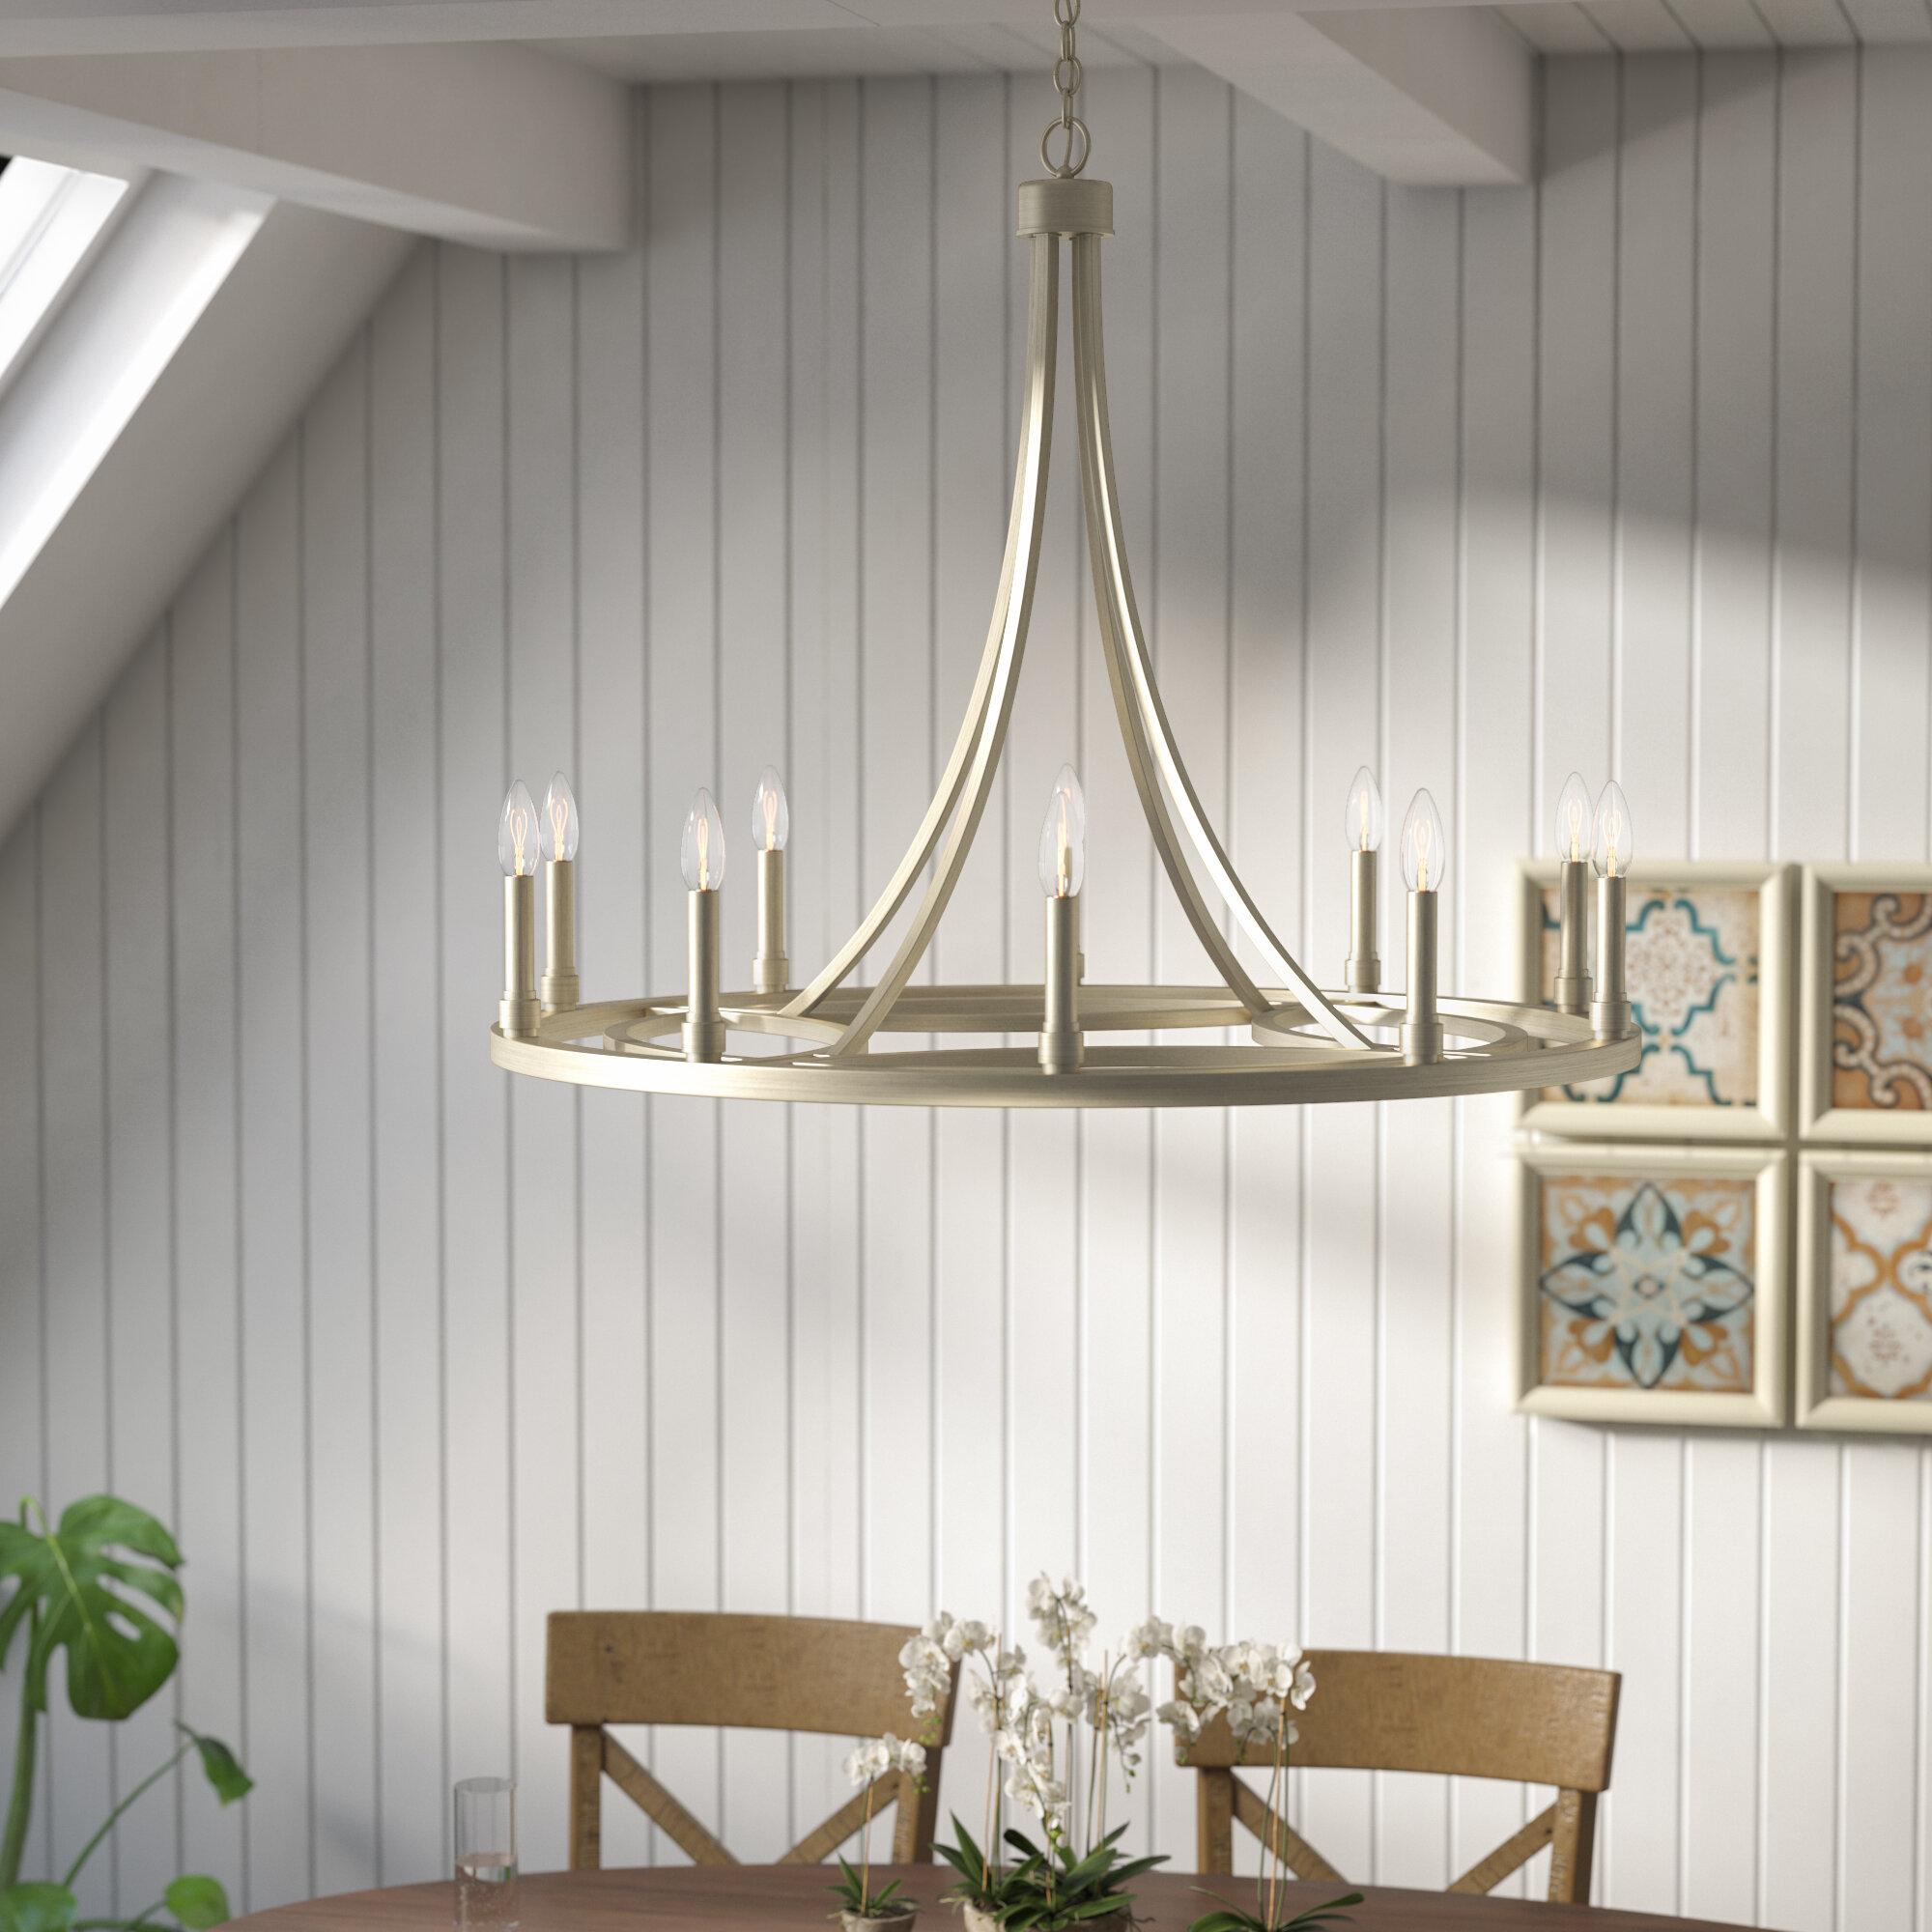 Willa Arlo Interiors Emery 10 Light Candle Style Wagon Wheel Chandelier Wayfair